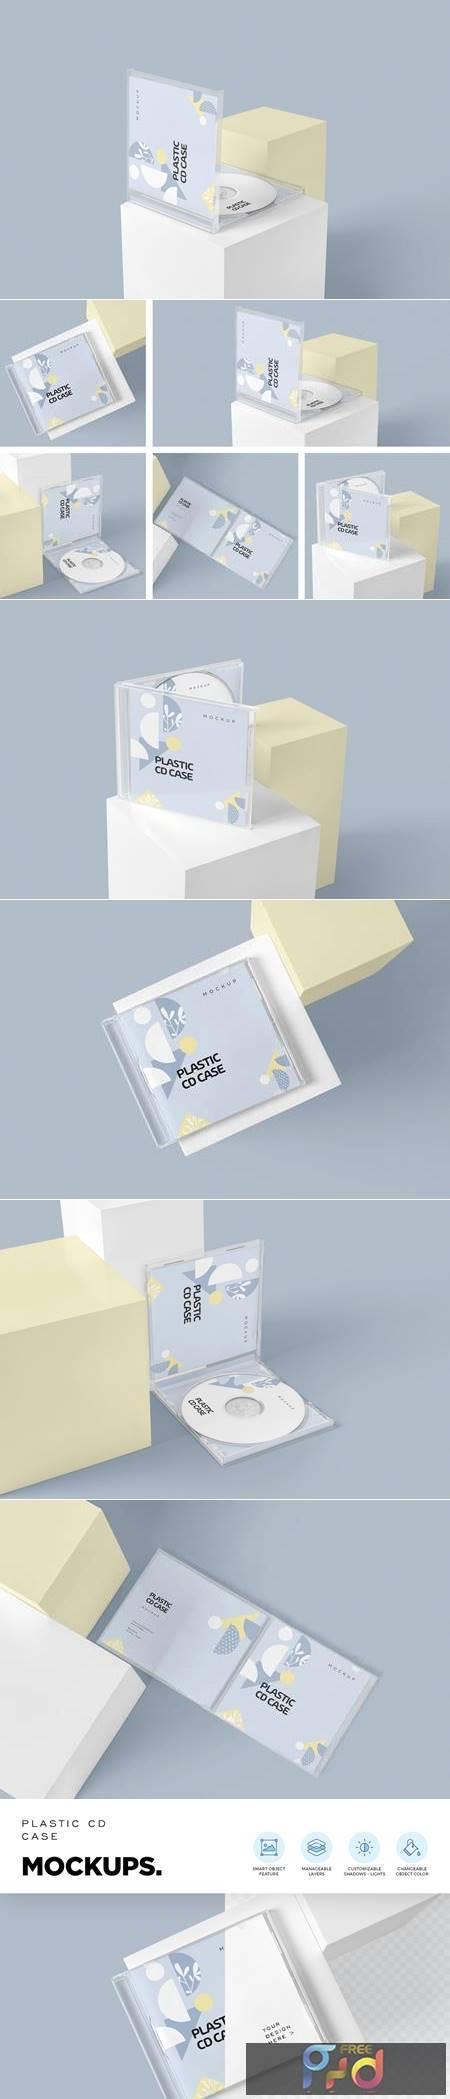 Plastic CD & Jewel Case Mockups 4646644 1